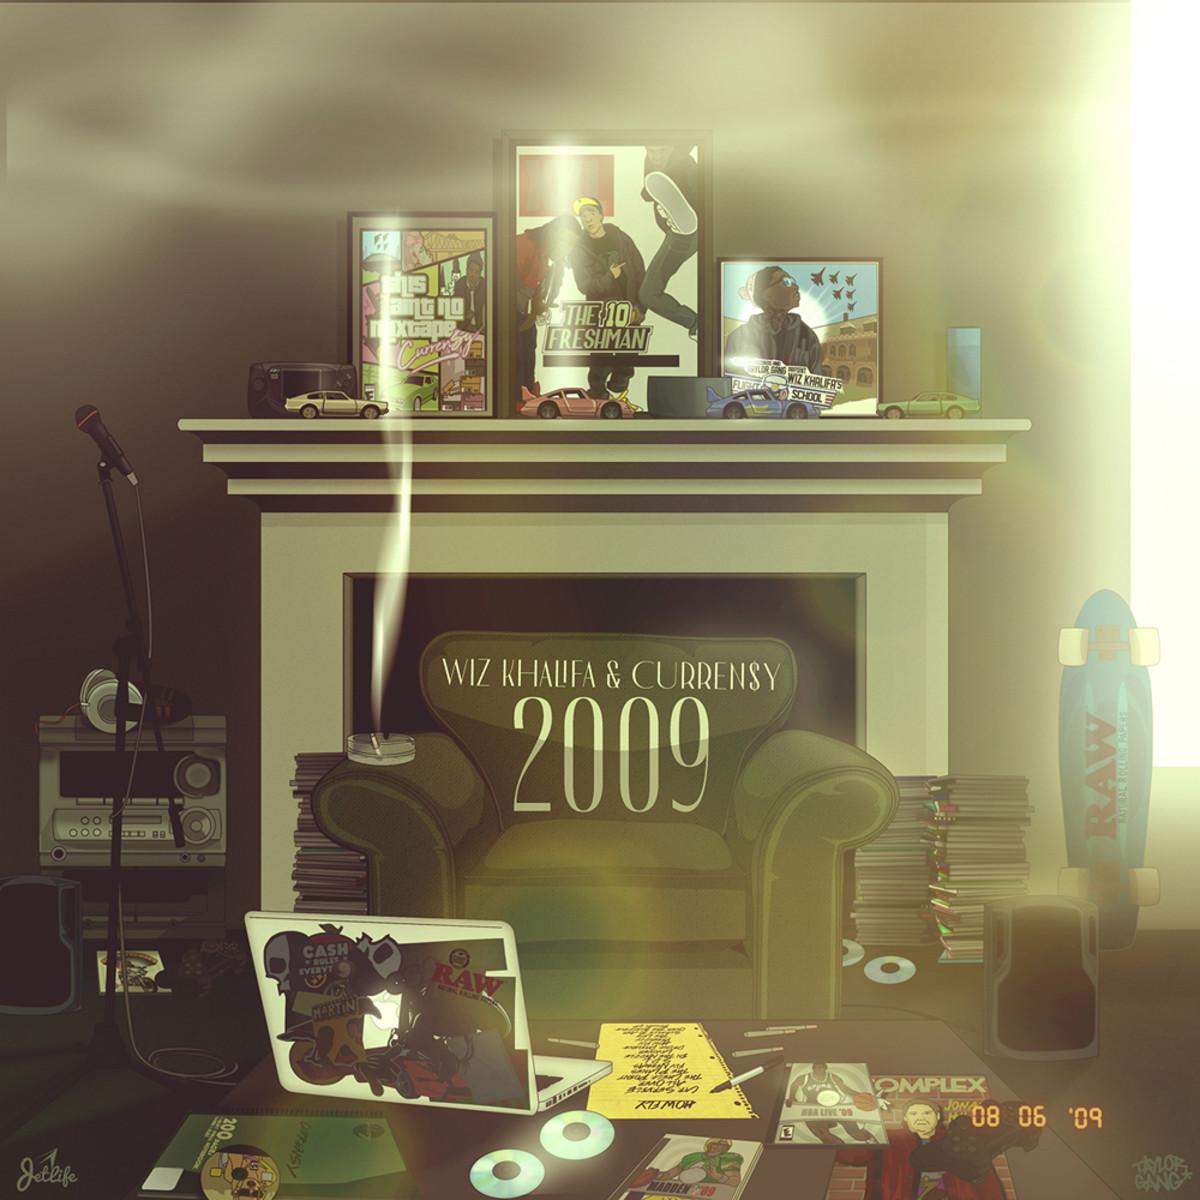 Wiz Khalifa/Curren$y '2009'